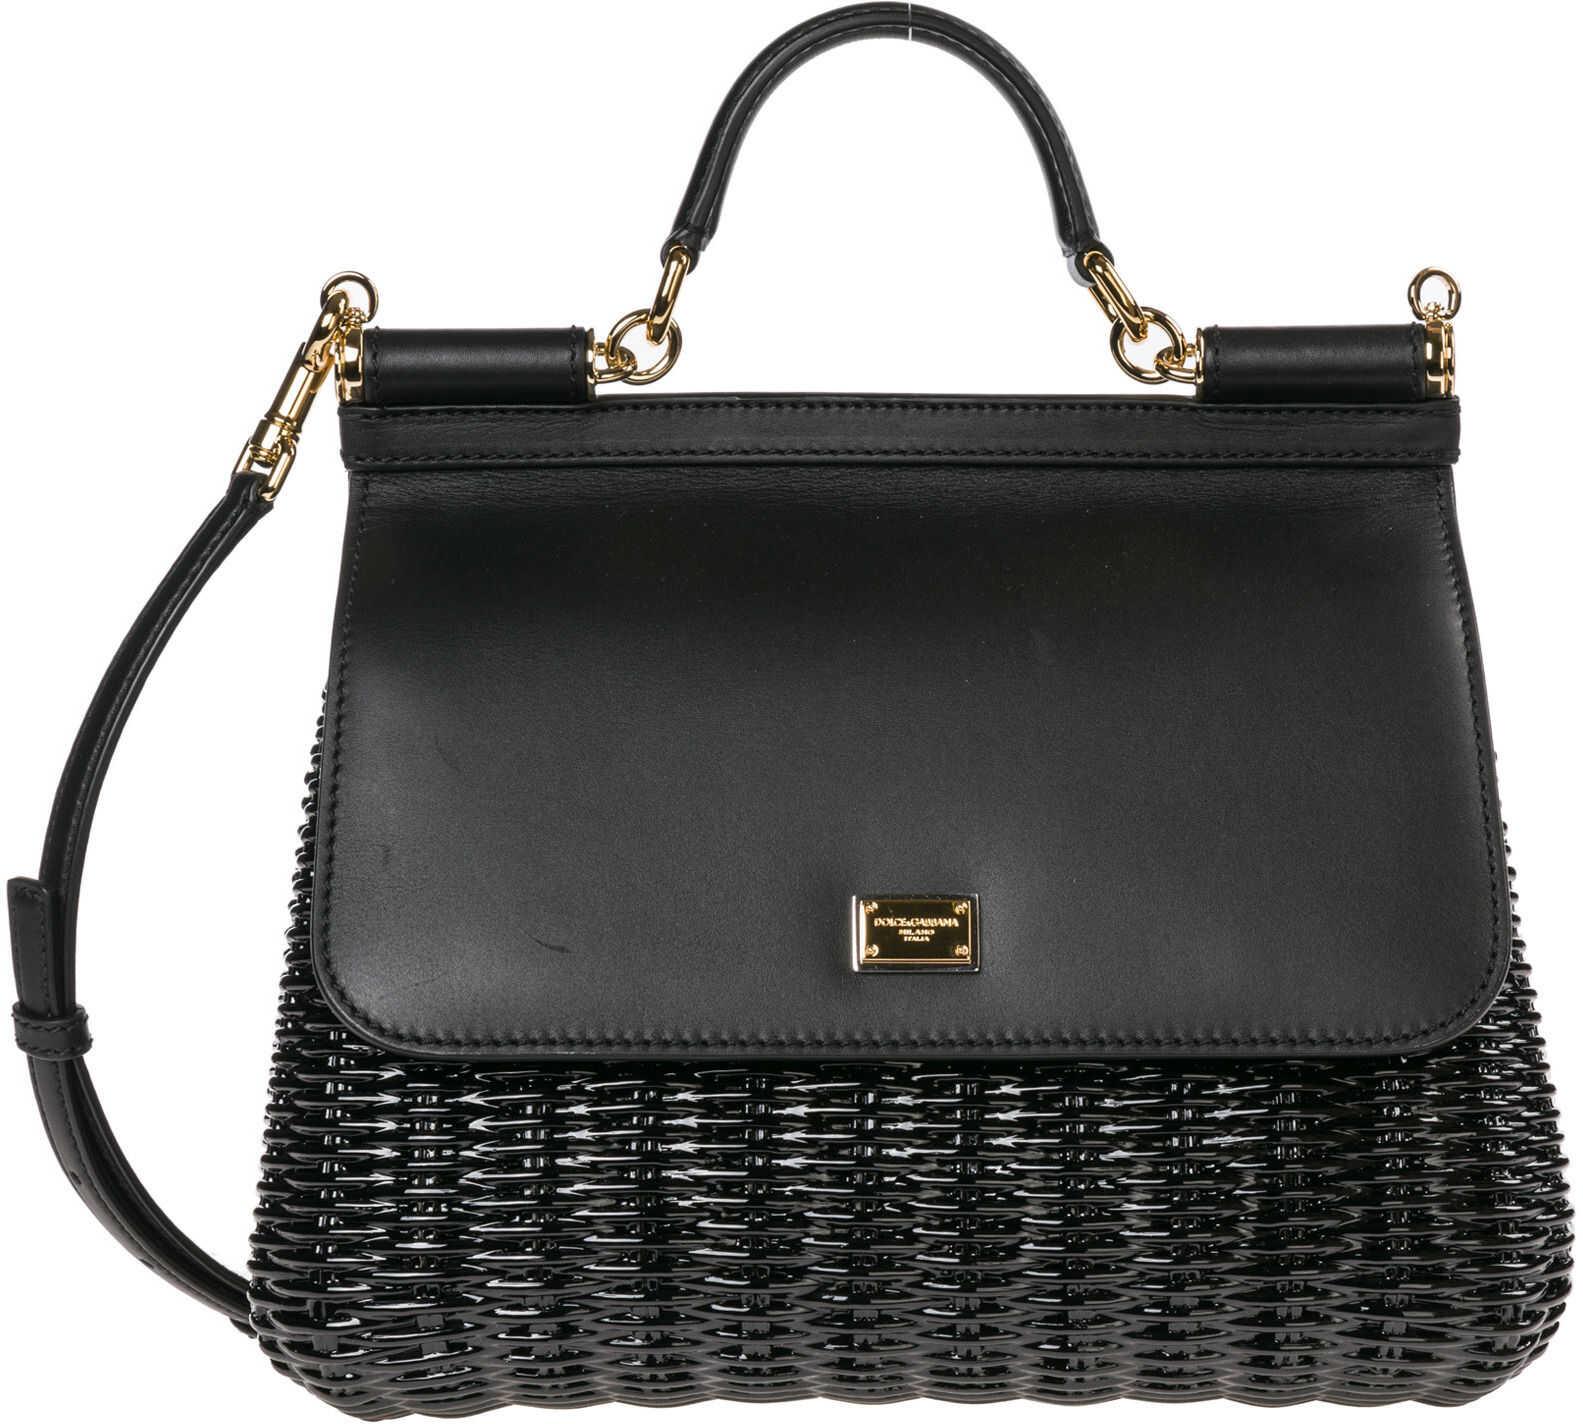 Dolce & Gabbana Purse Sicily Black